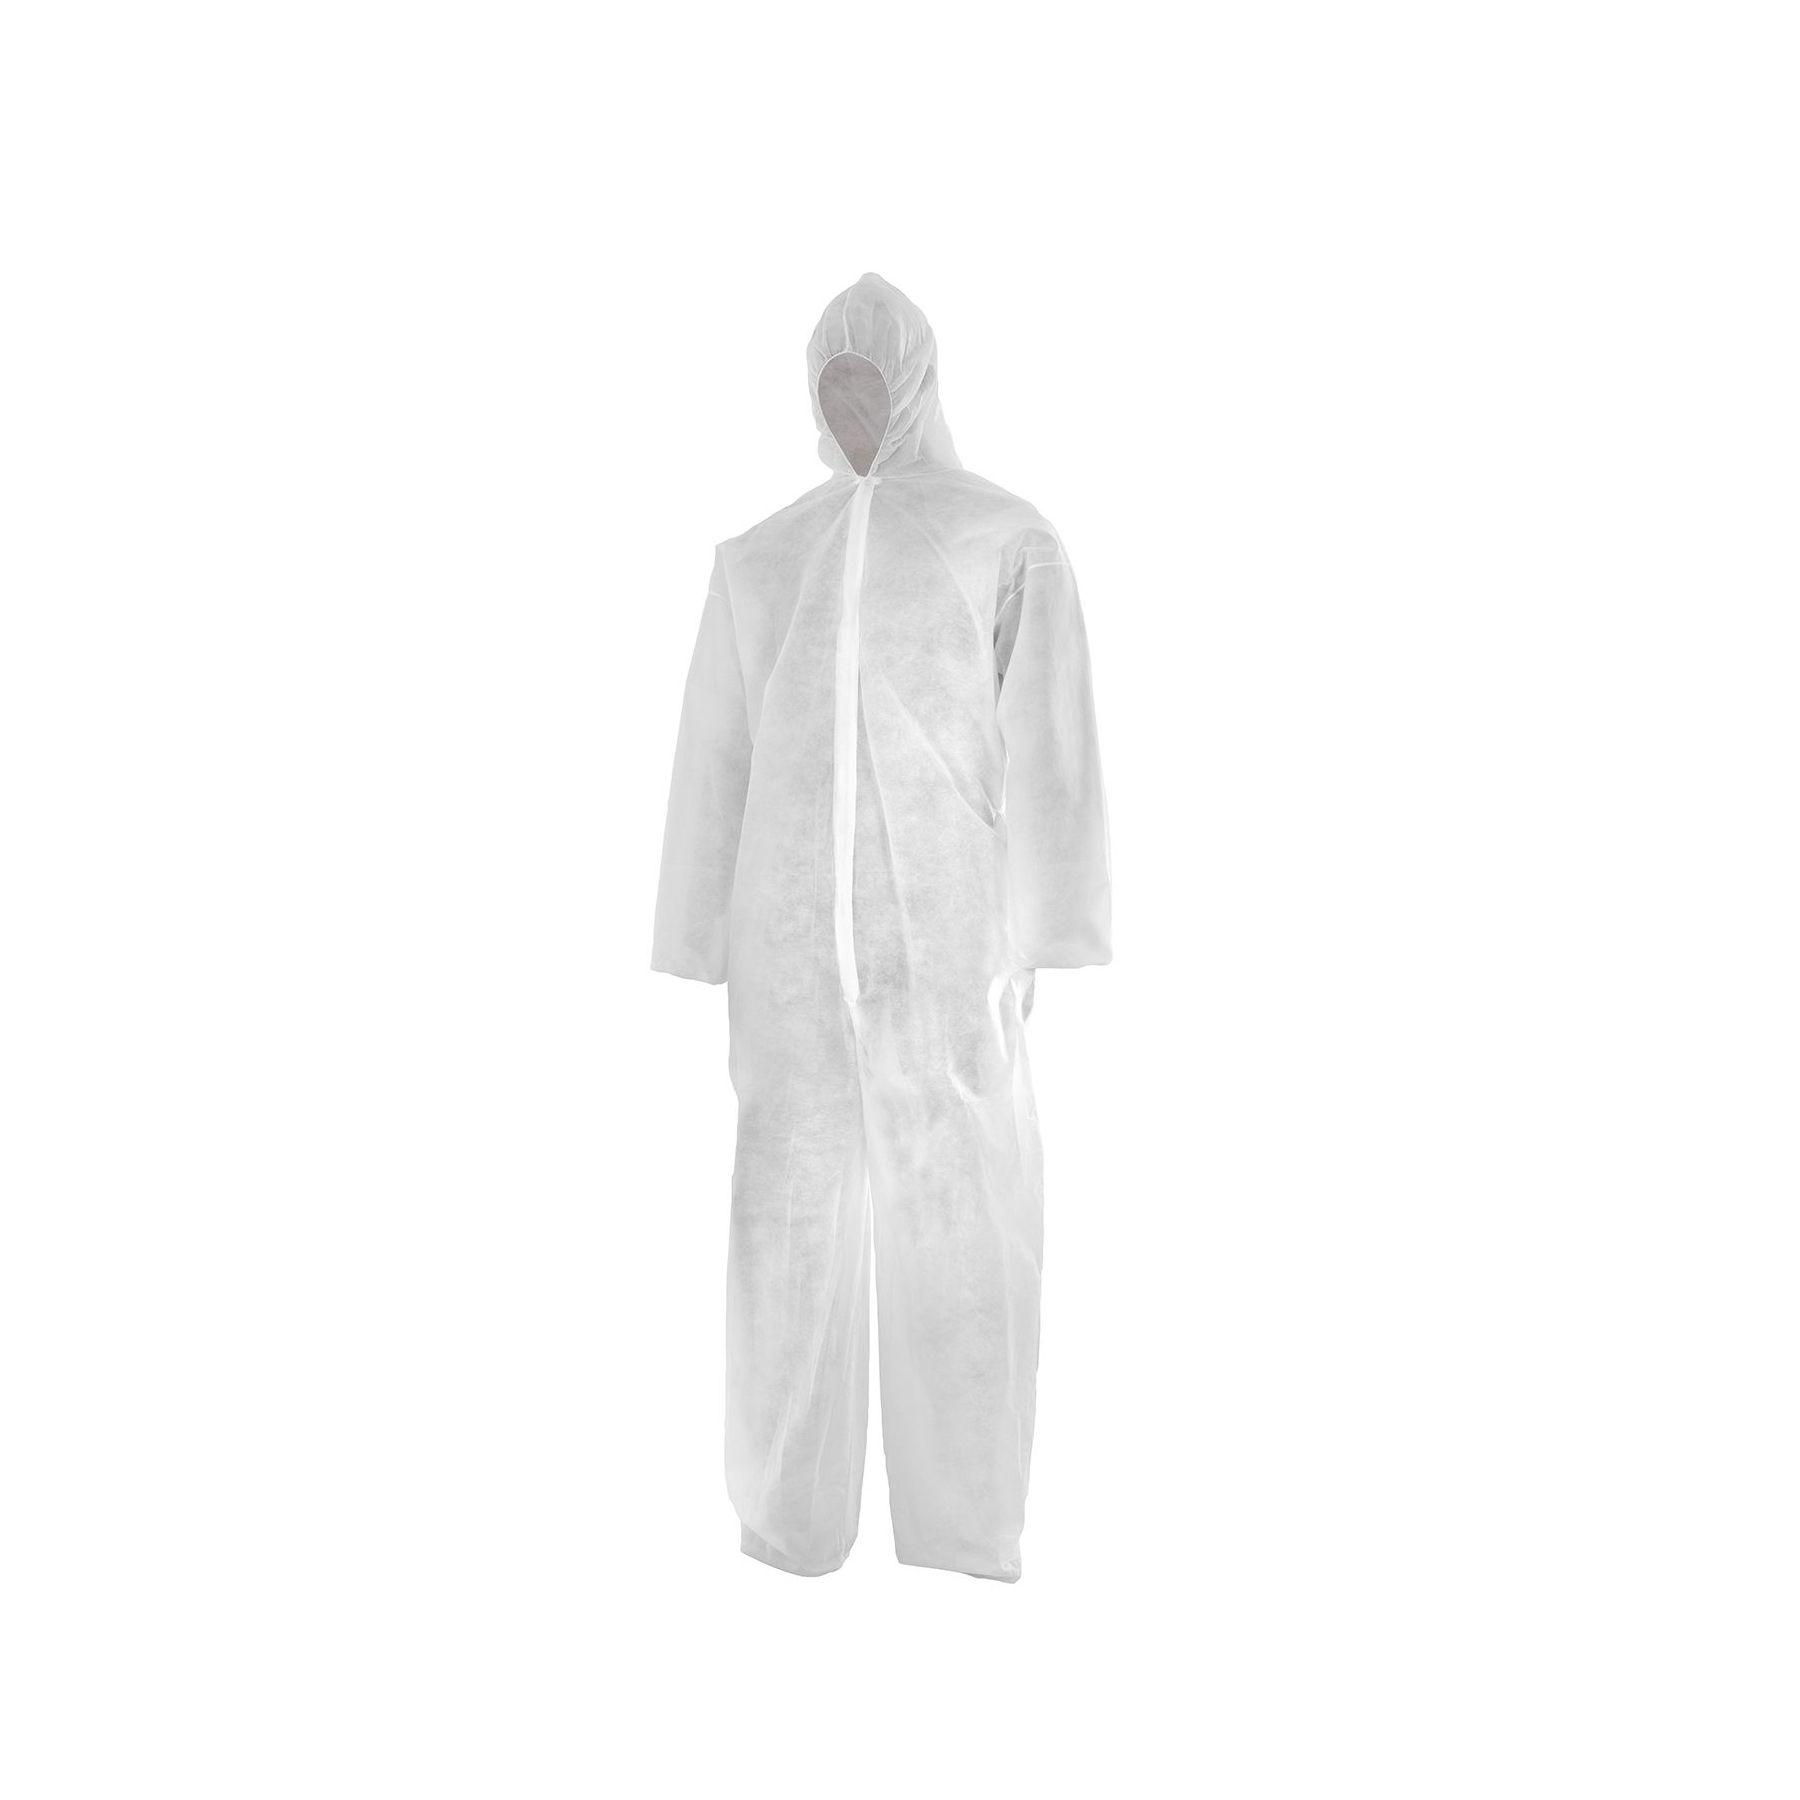 Mono impermeable con capucha desechable (ref: 201, varias tallas)